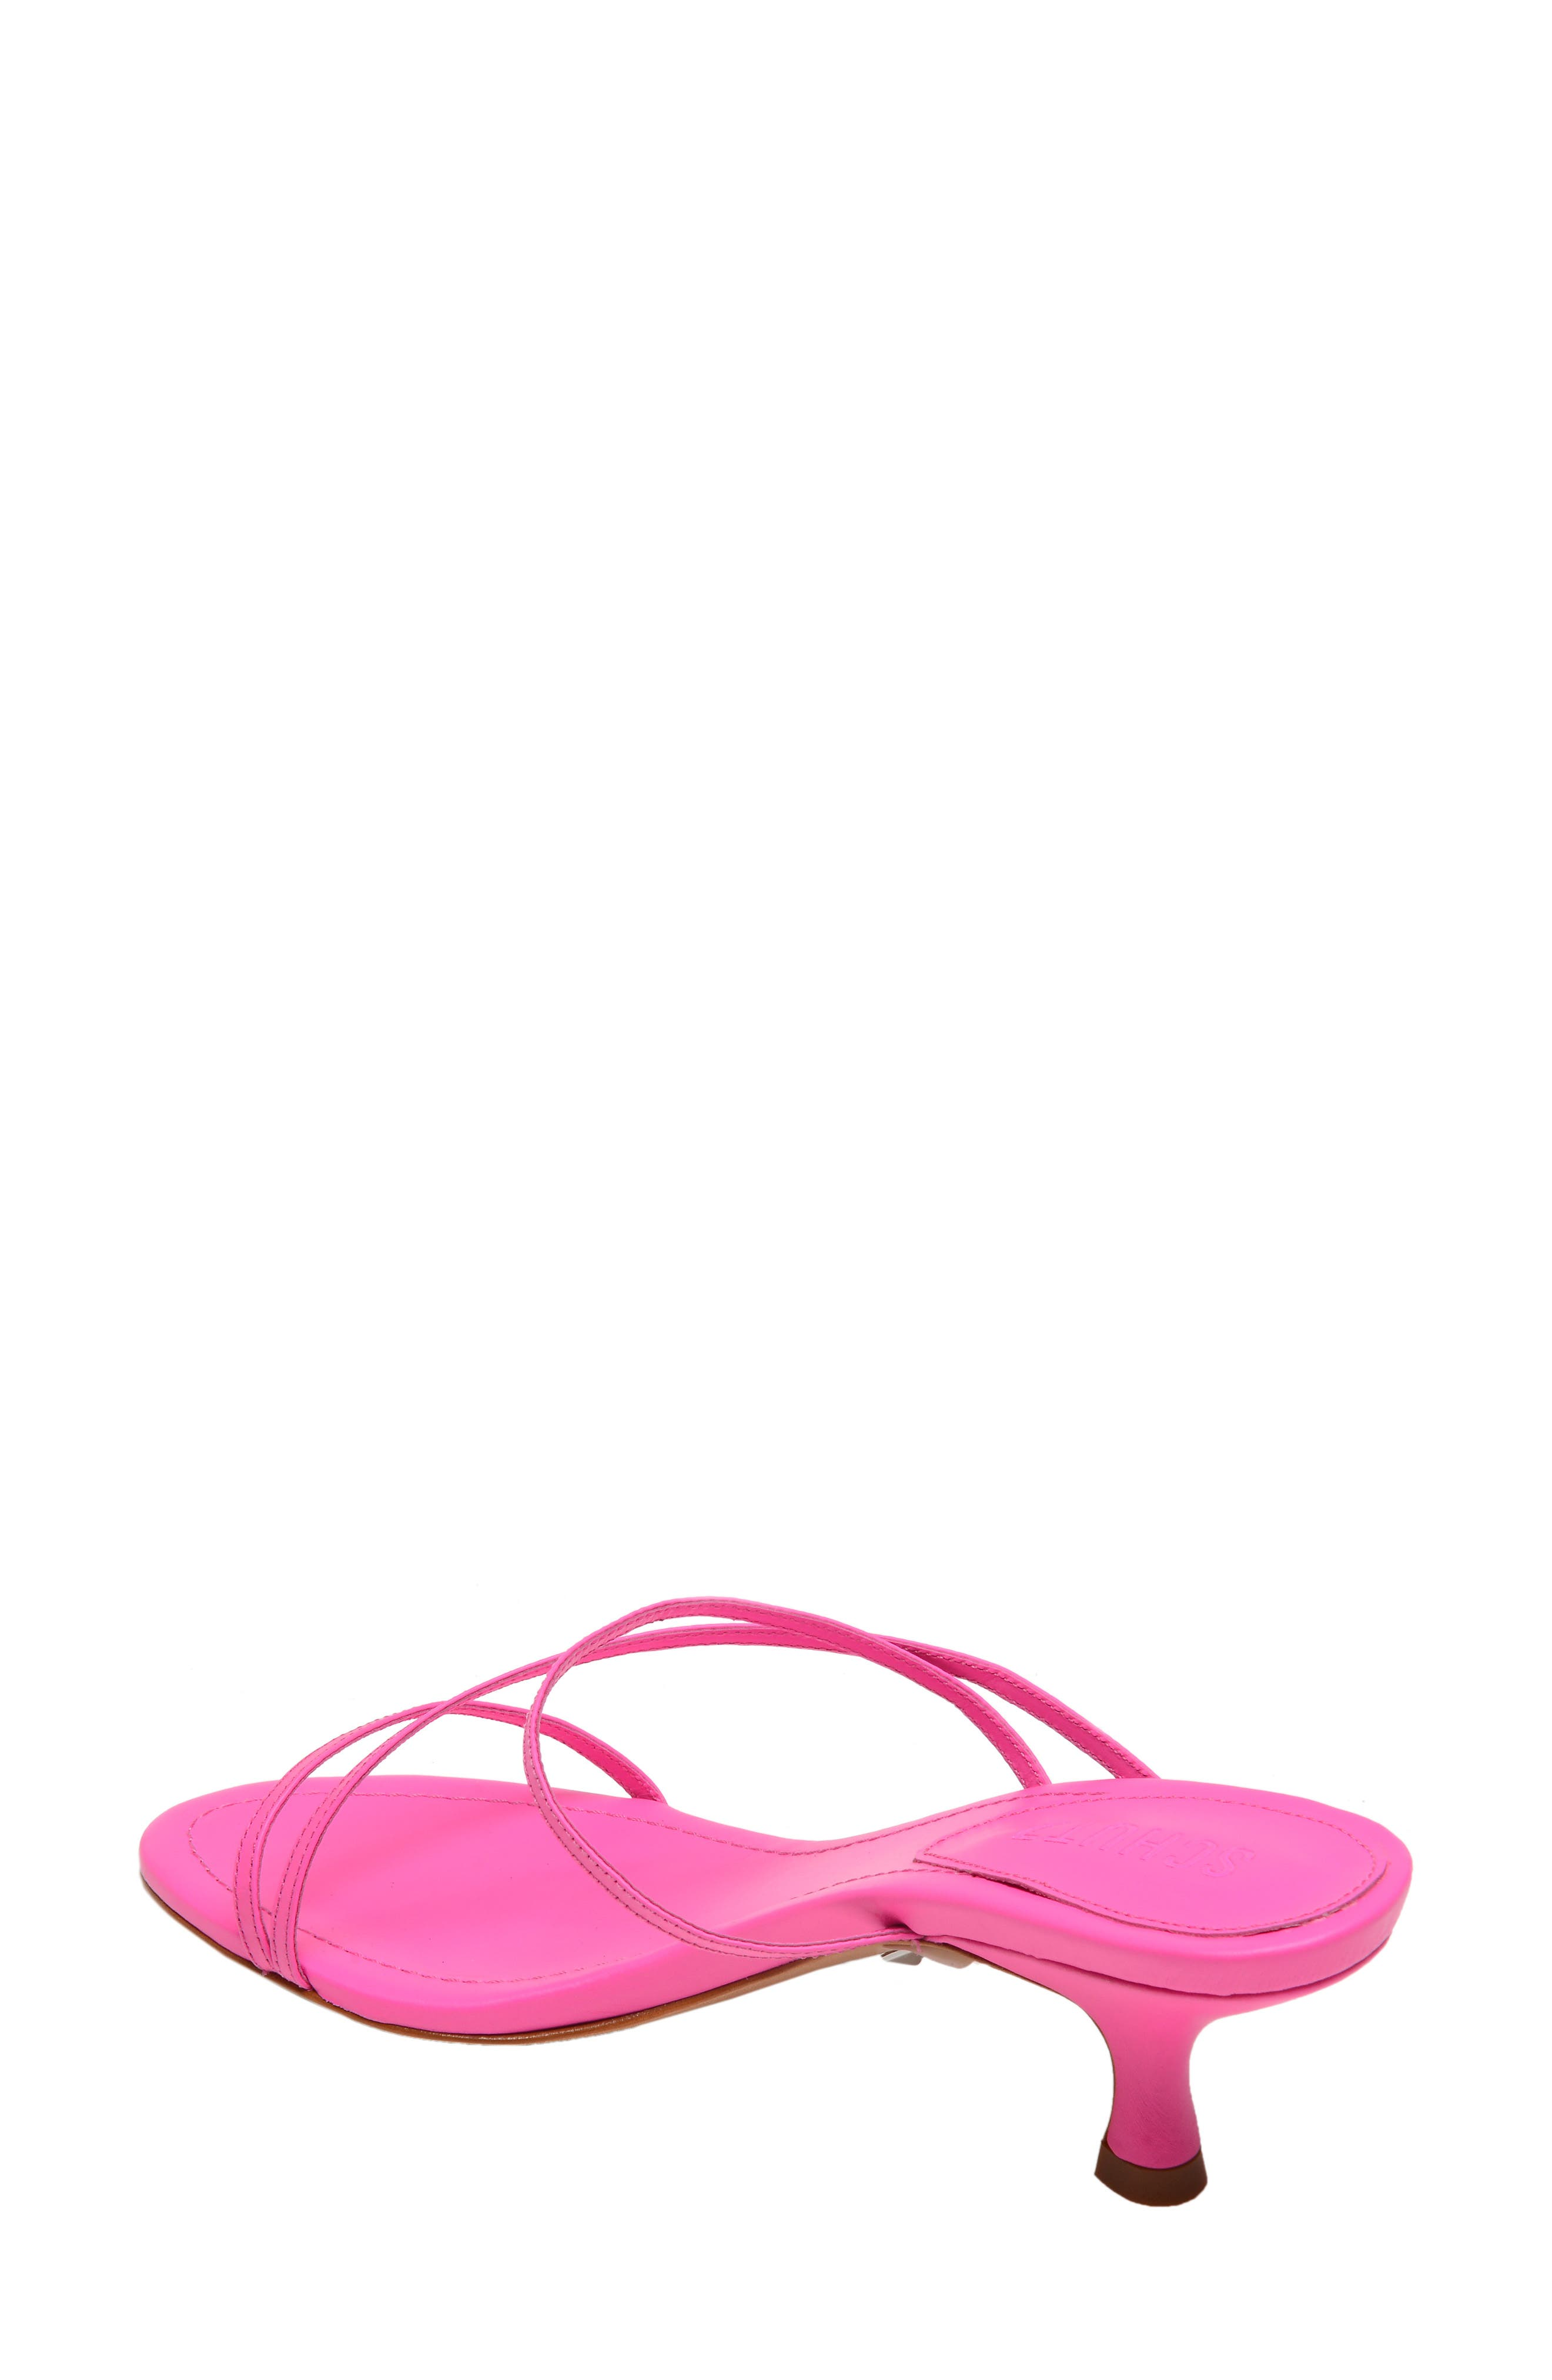 SCHUTZ, Evenise Slide Sandal, Alternate thumbnail 2, color, NEON PINK